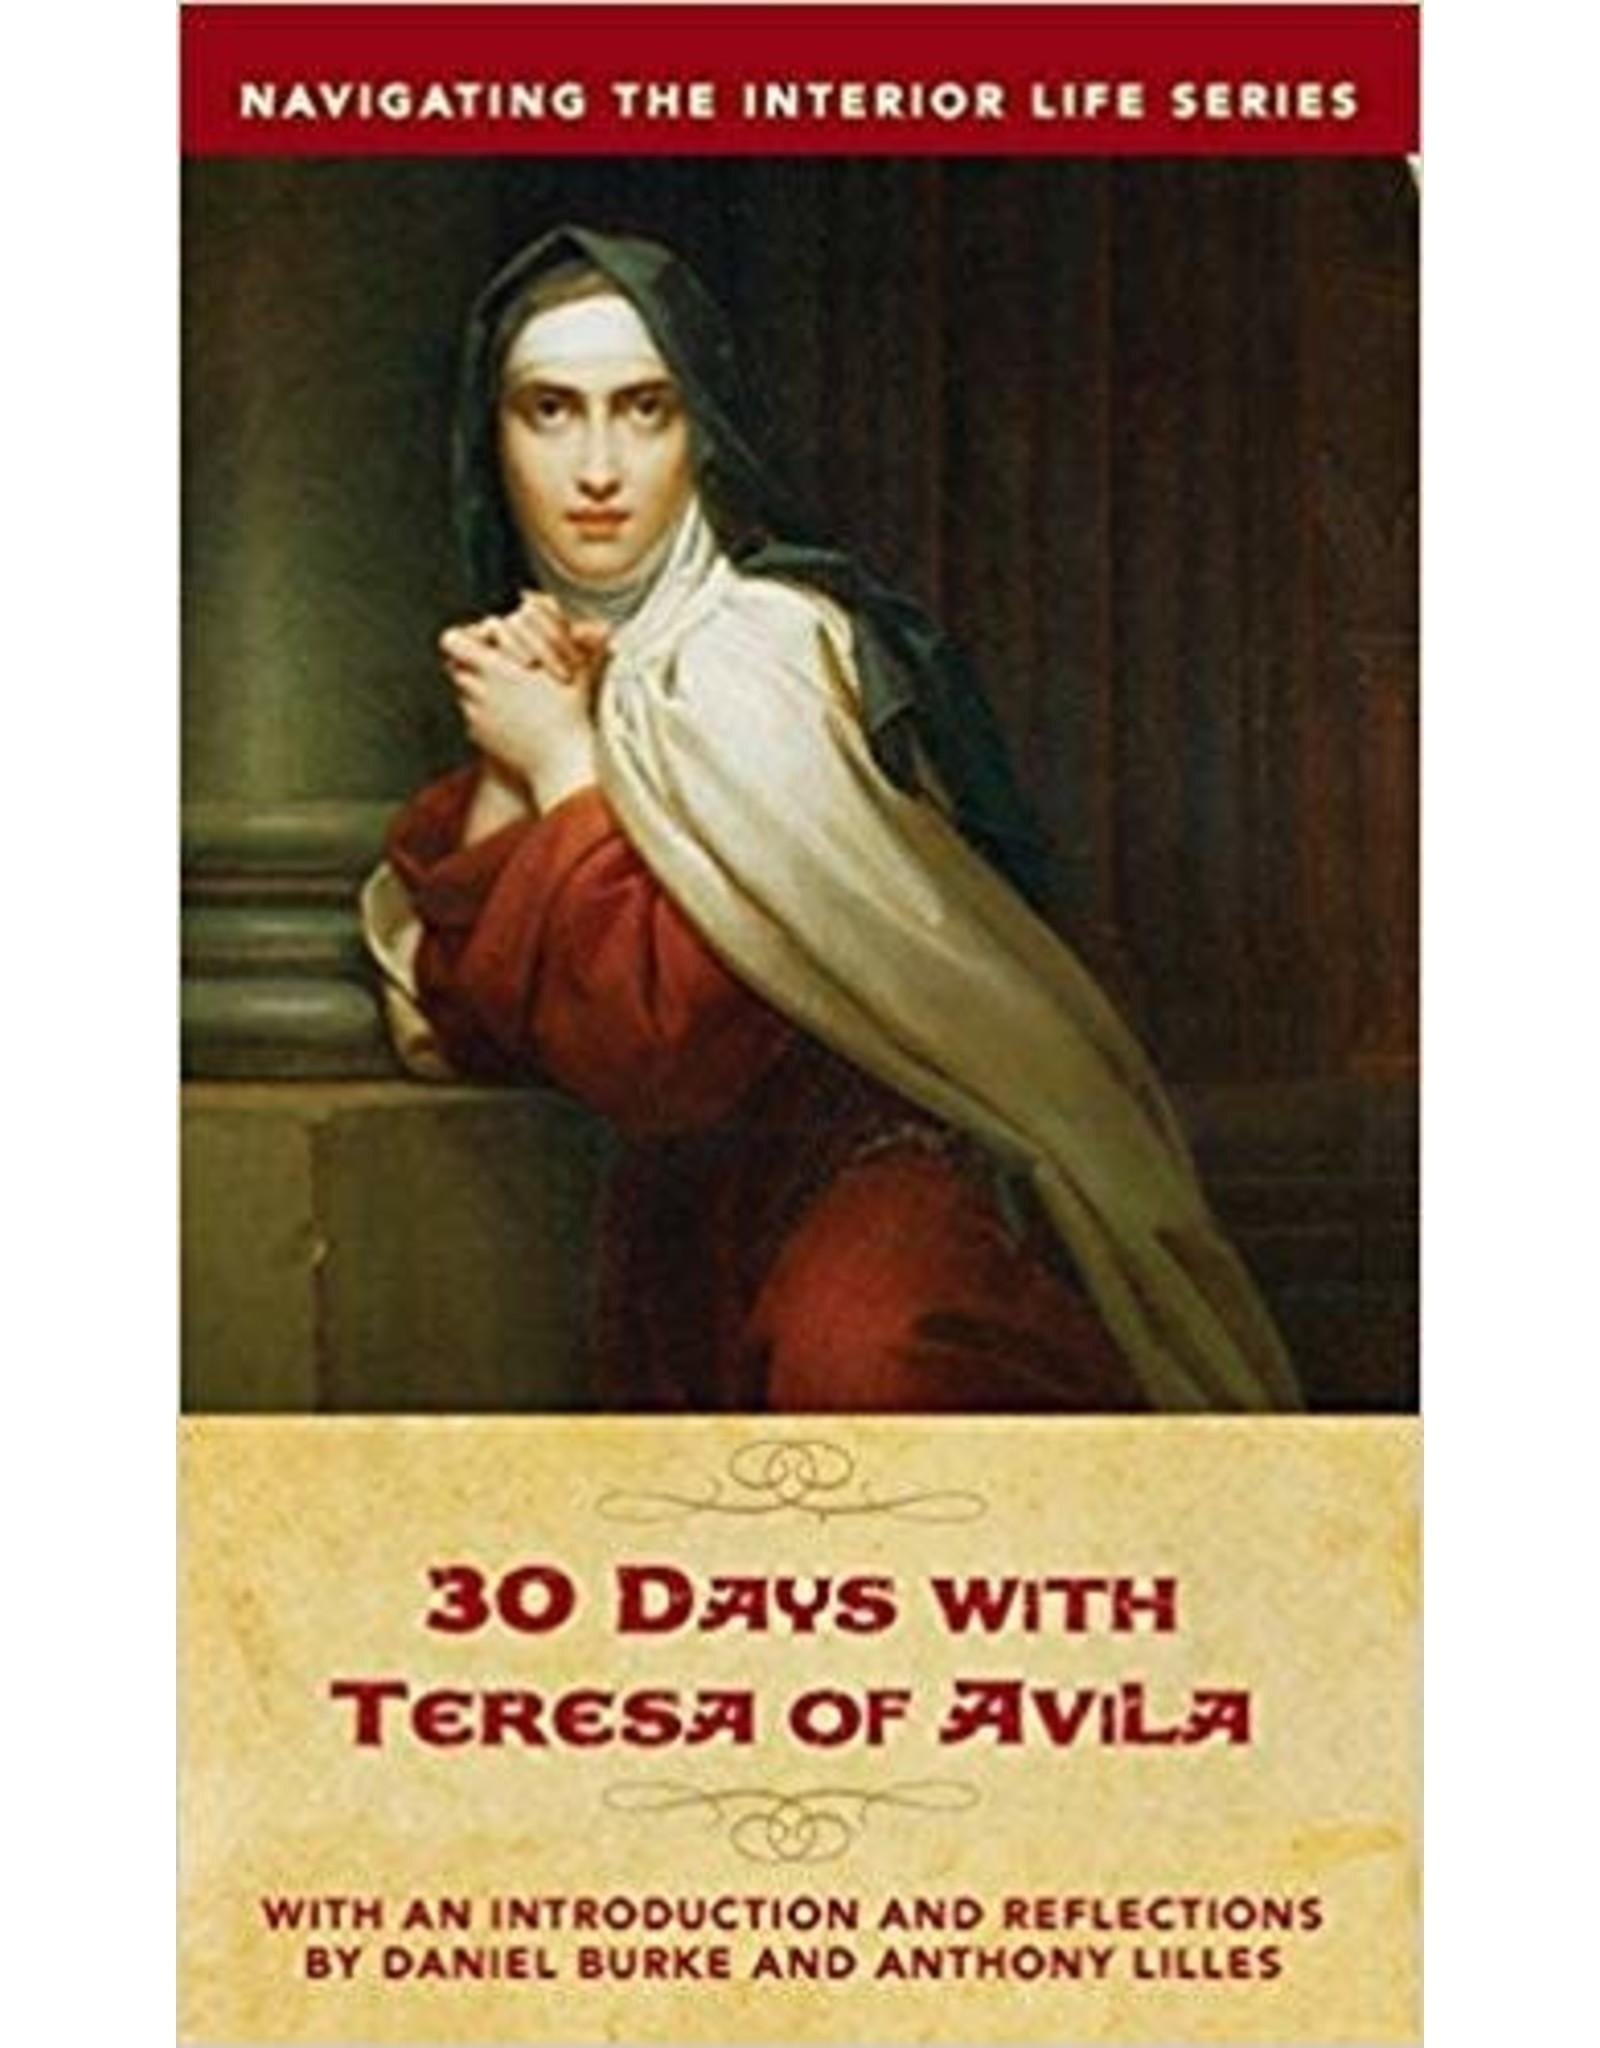 Sophia Press 30 Days with Teresa of Avila by Anthony Lilles, Dan Burke (Paperback)